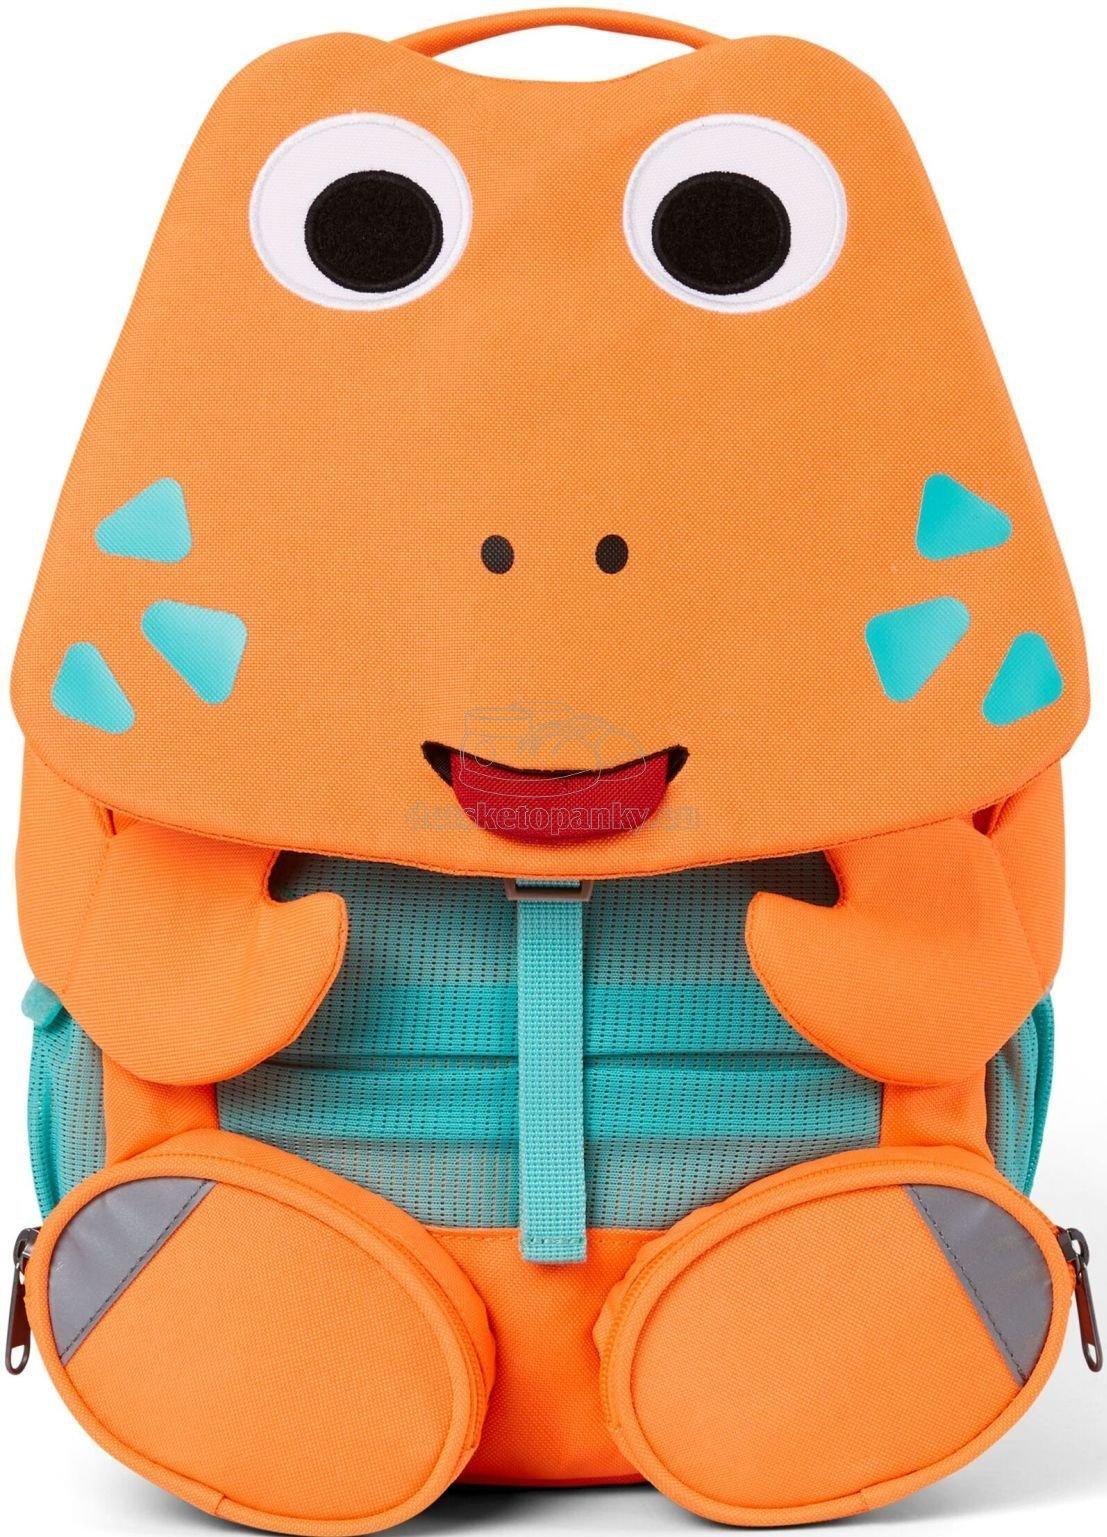 Detský batoh do škôlky Affenzahn Large Friend Crab - neon orange